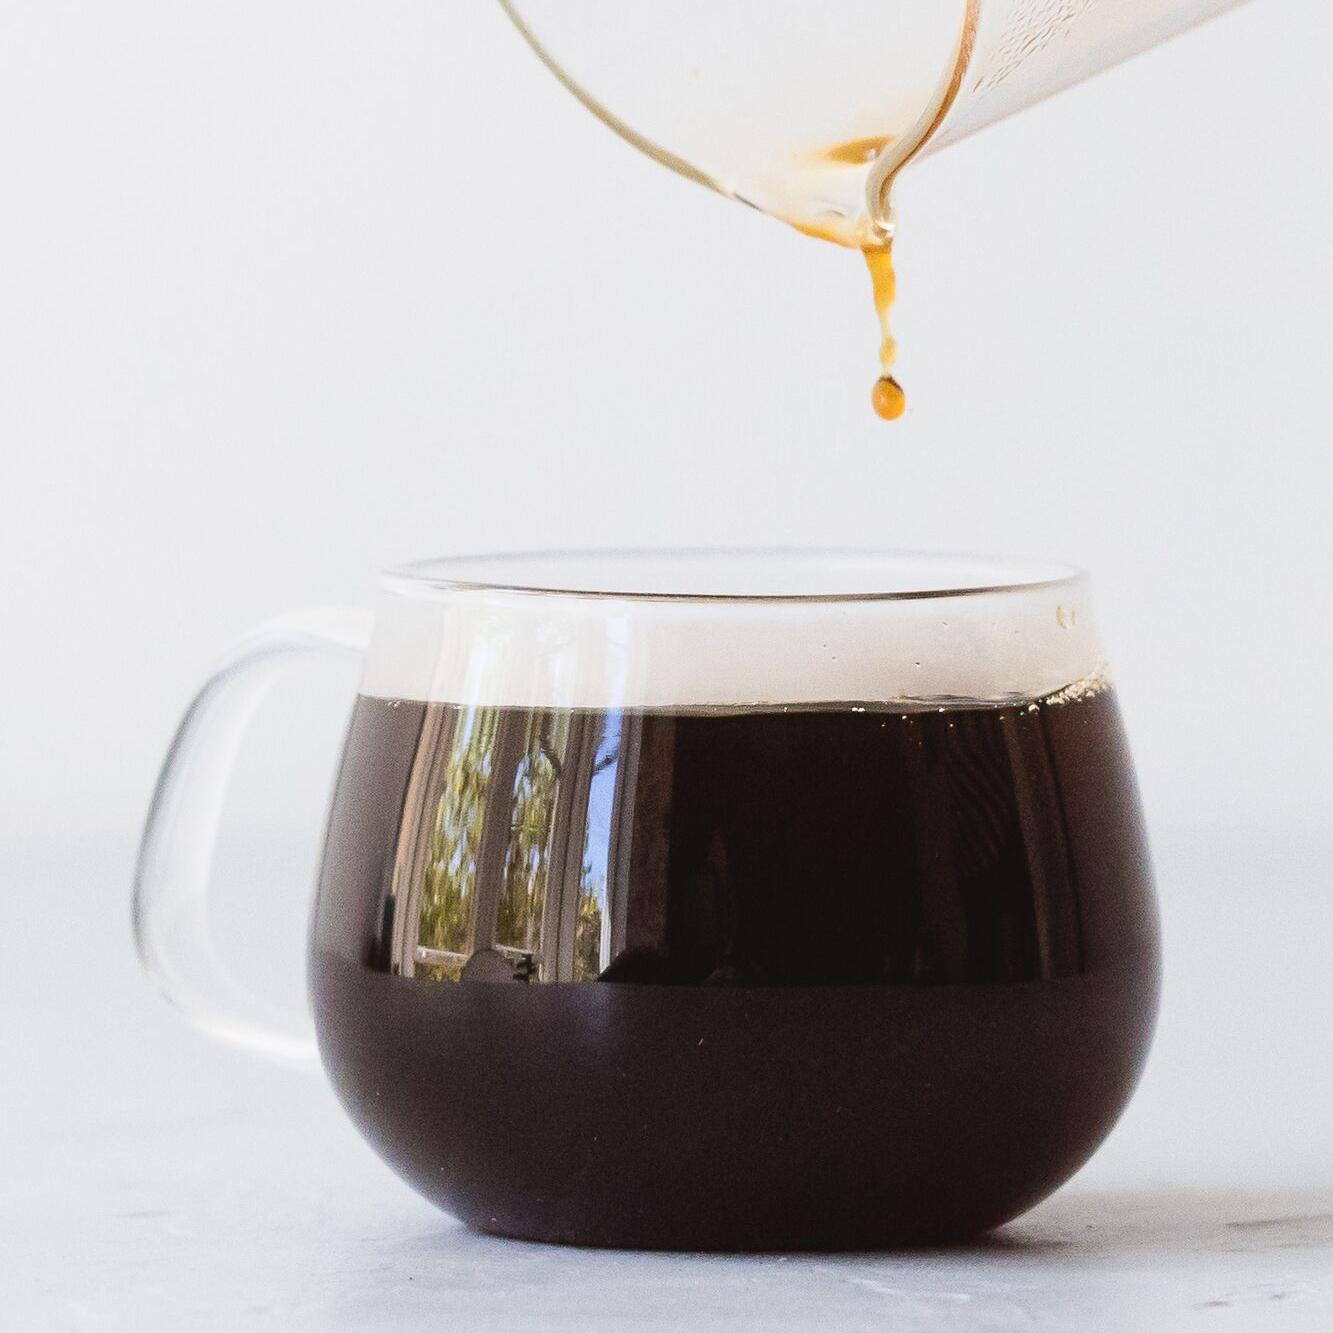 black coffee in glass mug, last drop falling from glass carafe above mug